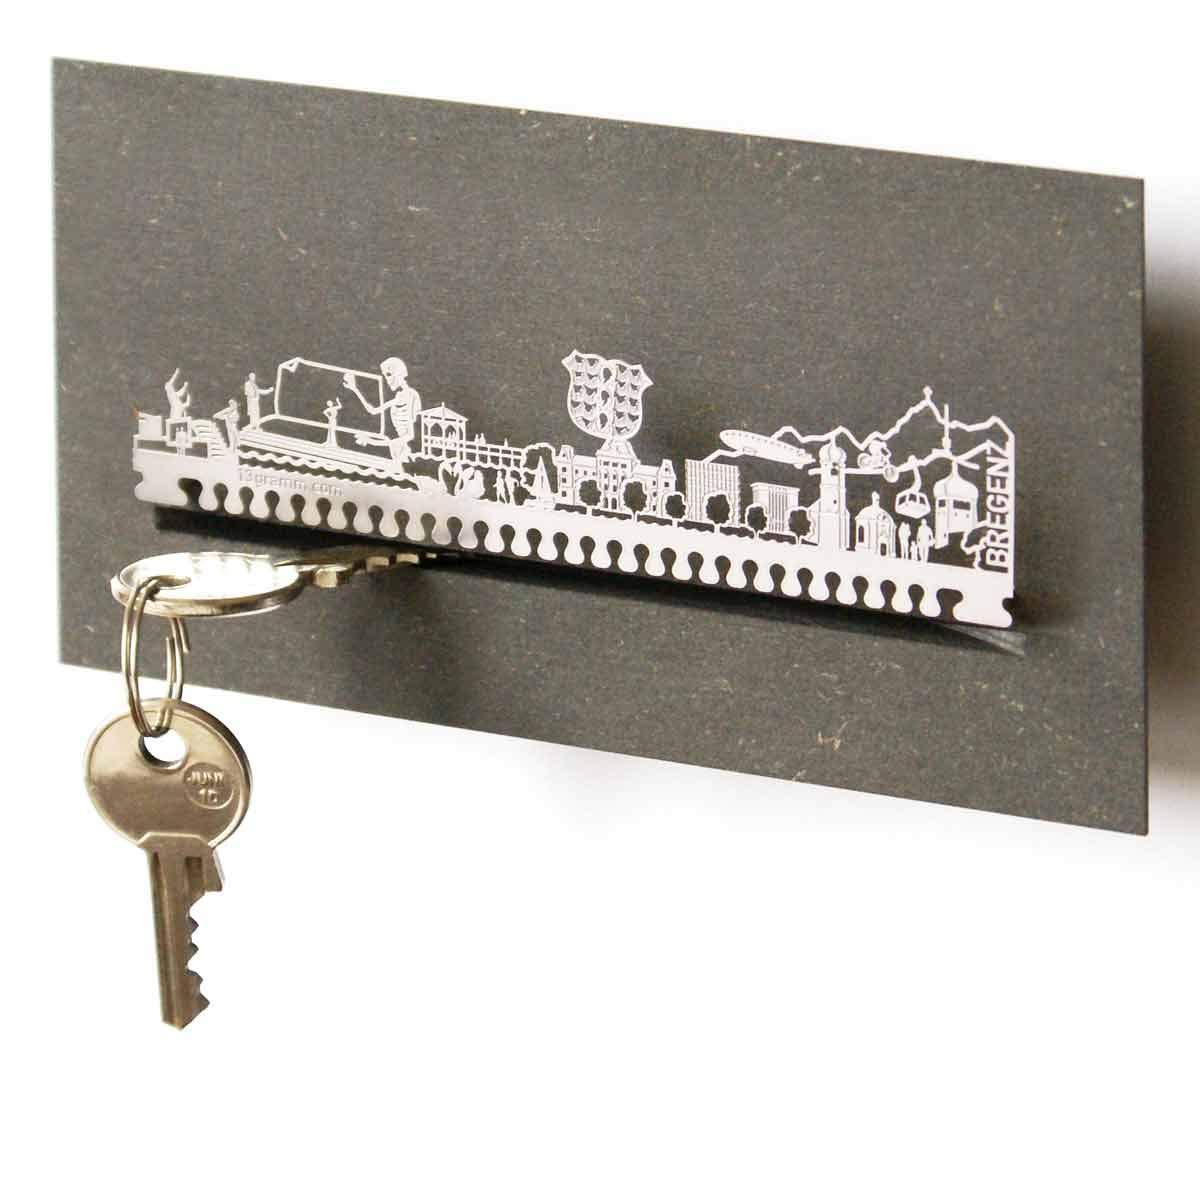 13gramm Bregenz-Skyline Schl/üsselbrett Souvenir in der Geschenk-Box